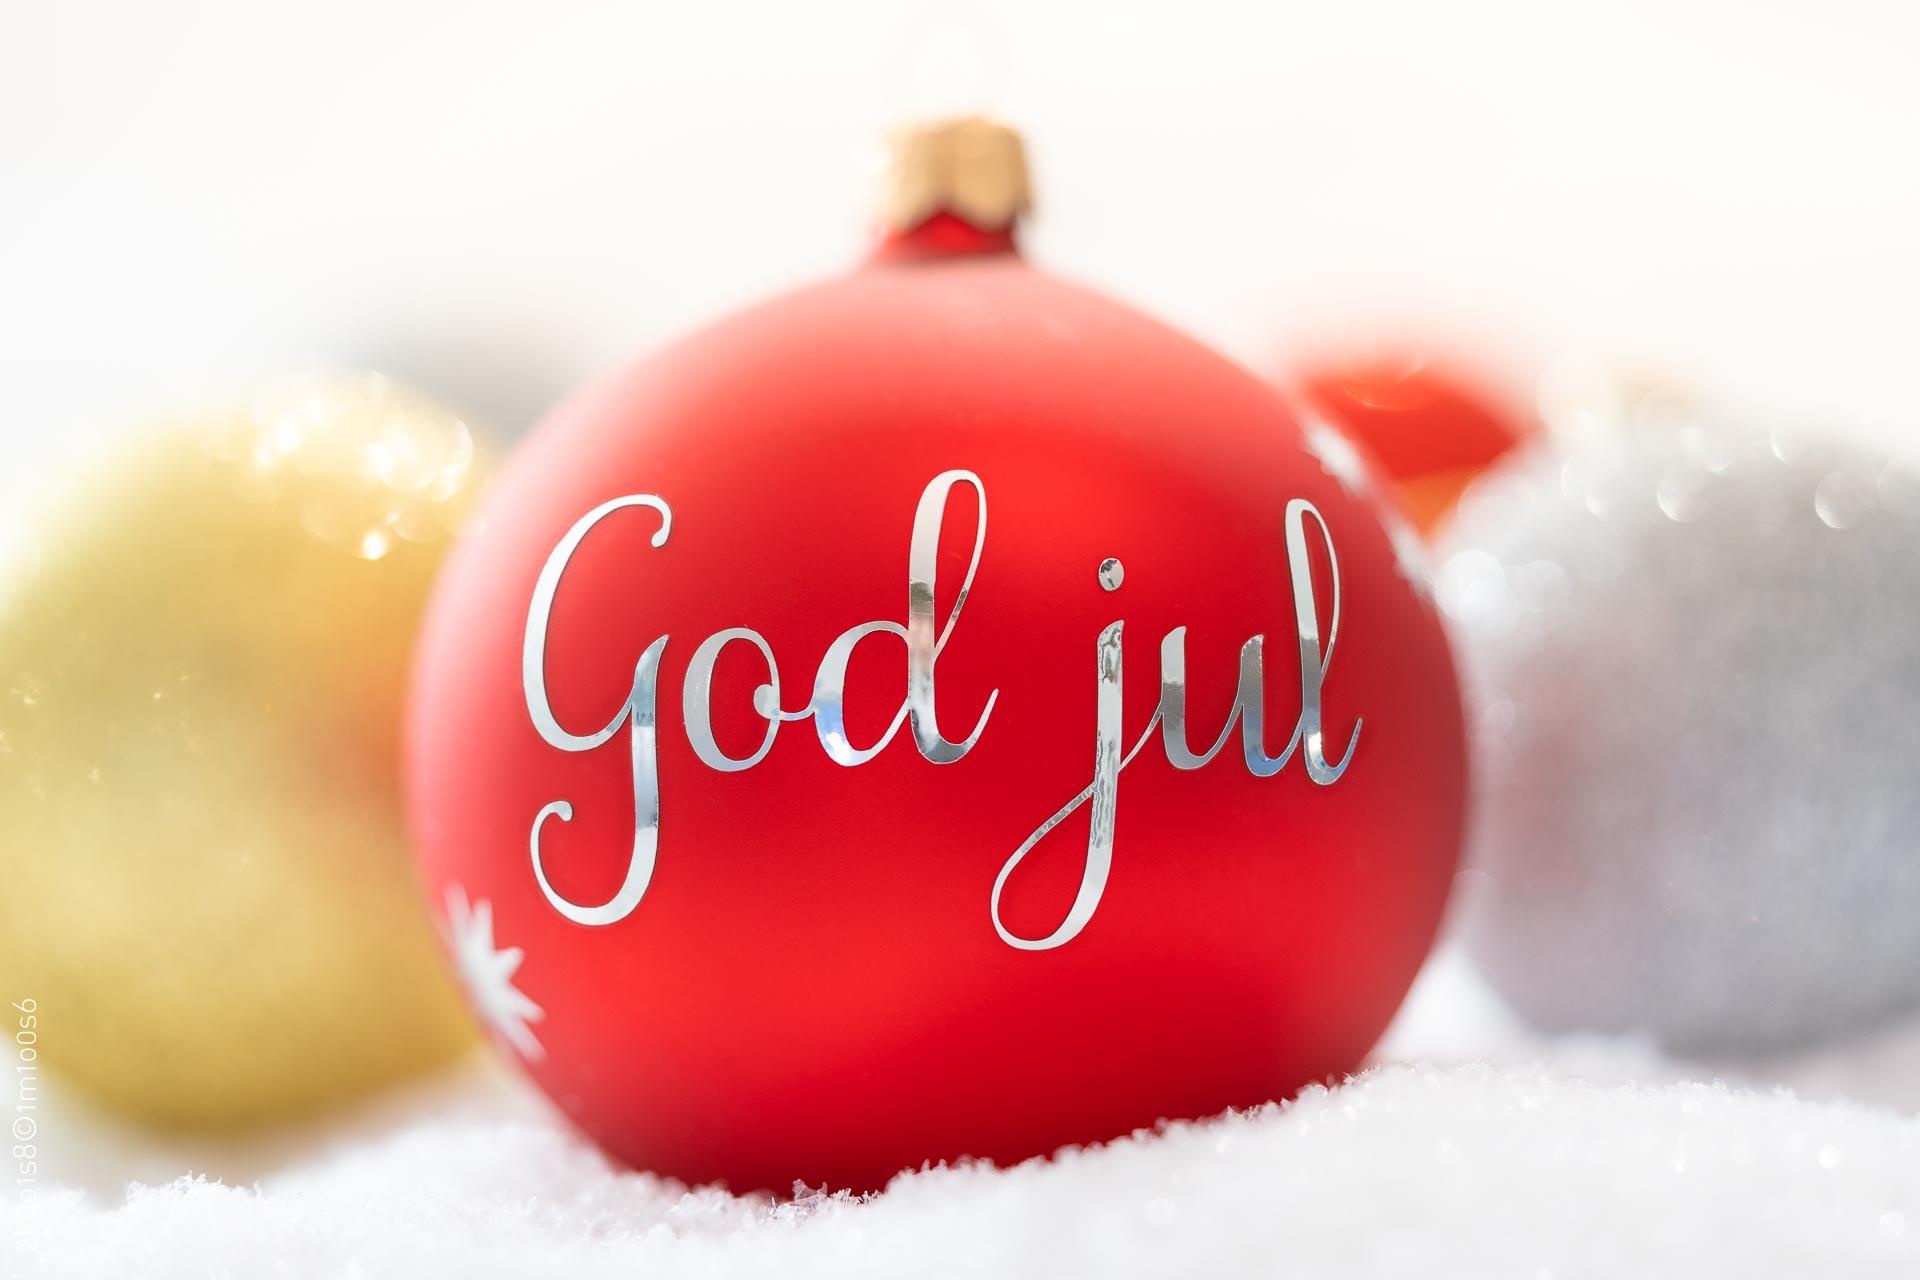 20181106-01386-CopyrightRobinLund-God-jul-julekuler